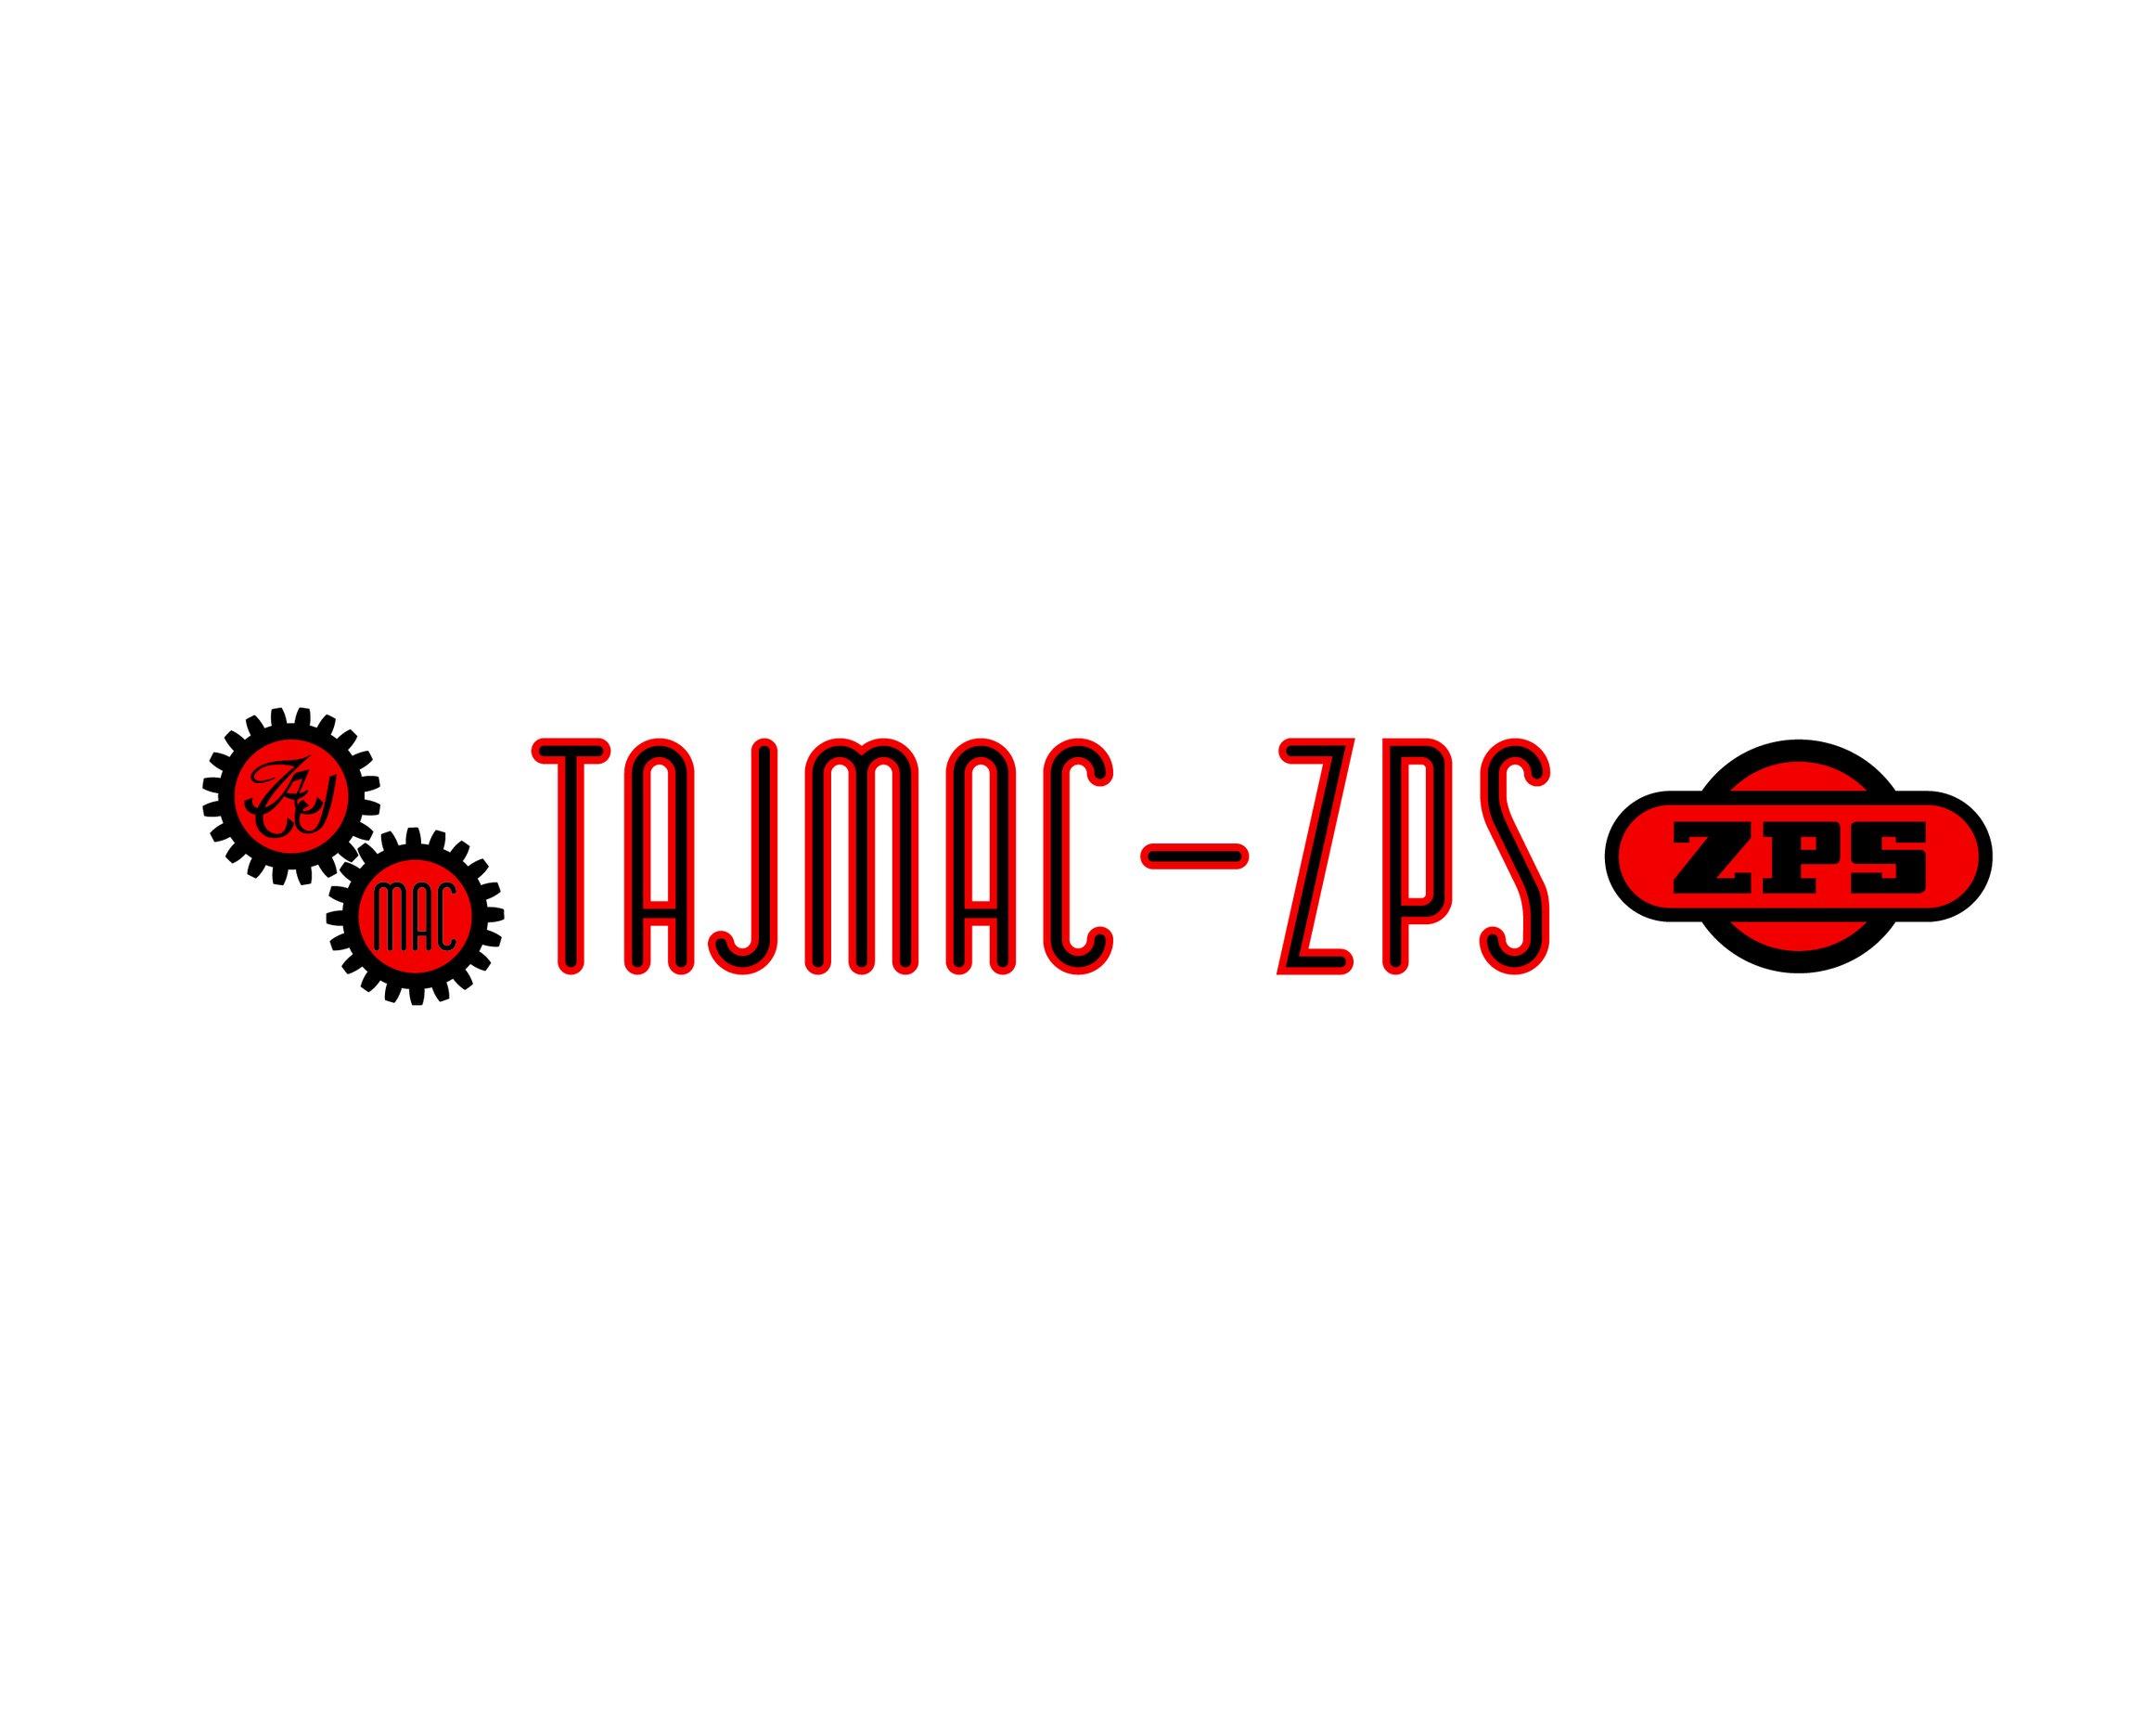 CZ_IMG_TAJMAC-ZPS_logo.jpg